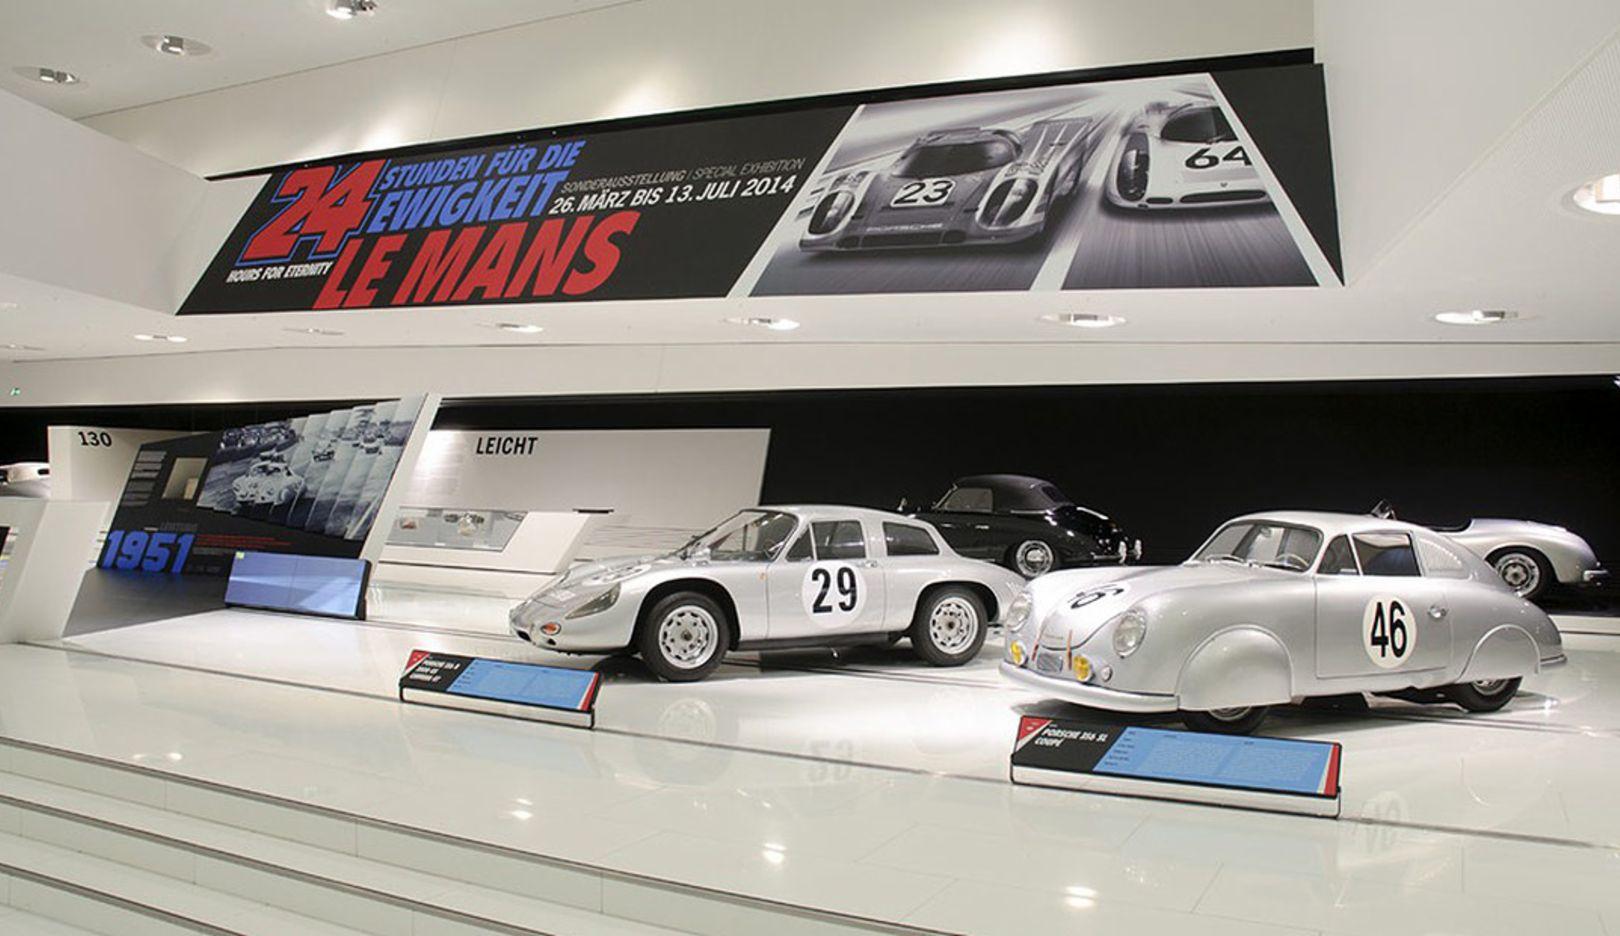 Exhibition Le Mans, Porsche museum, 2014, Porsche AG